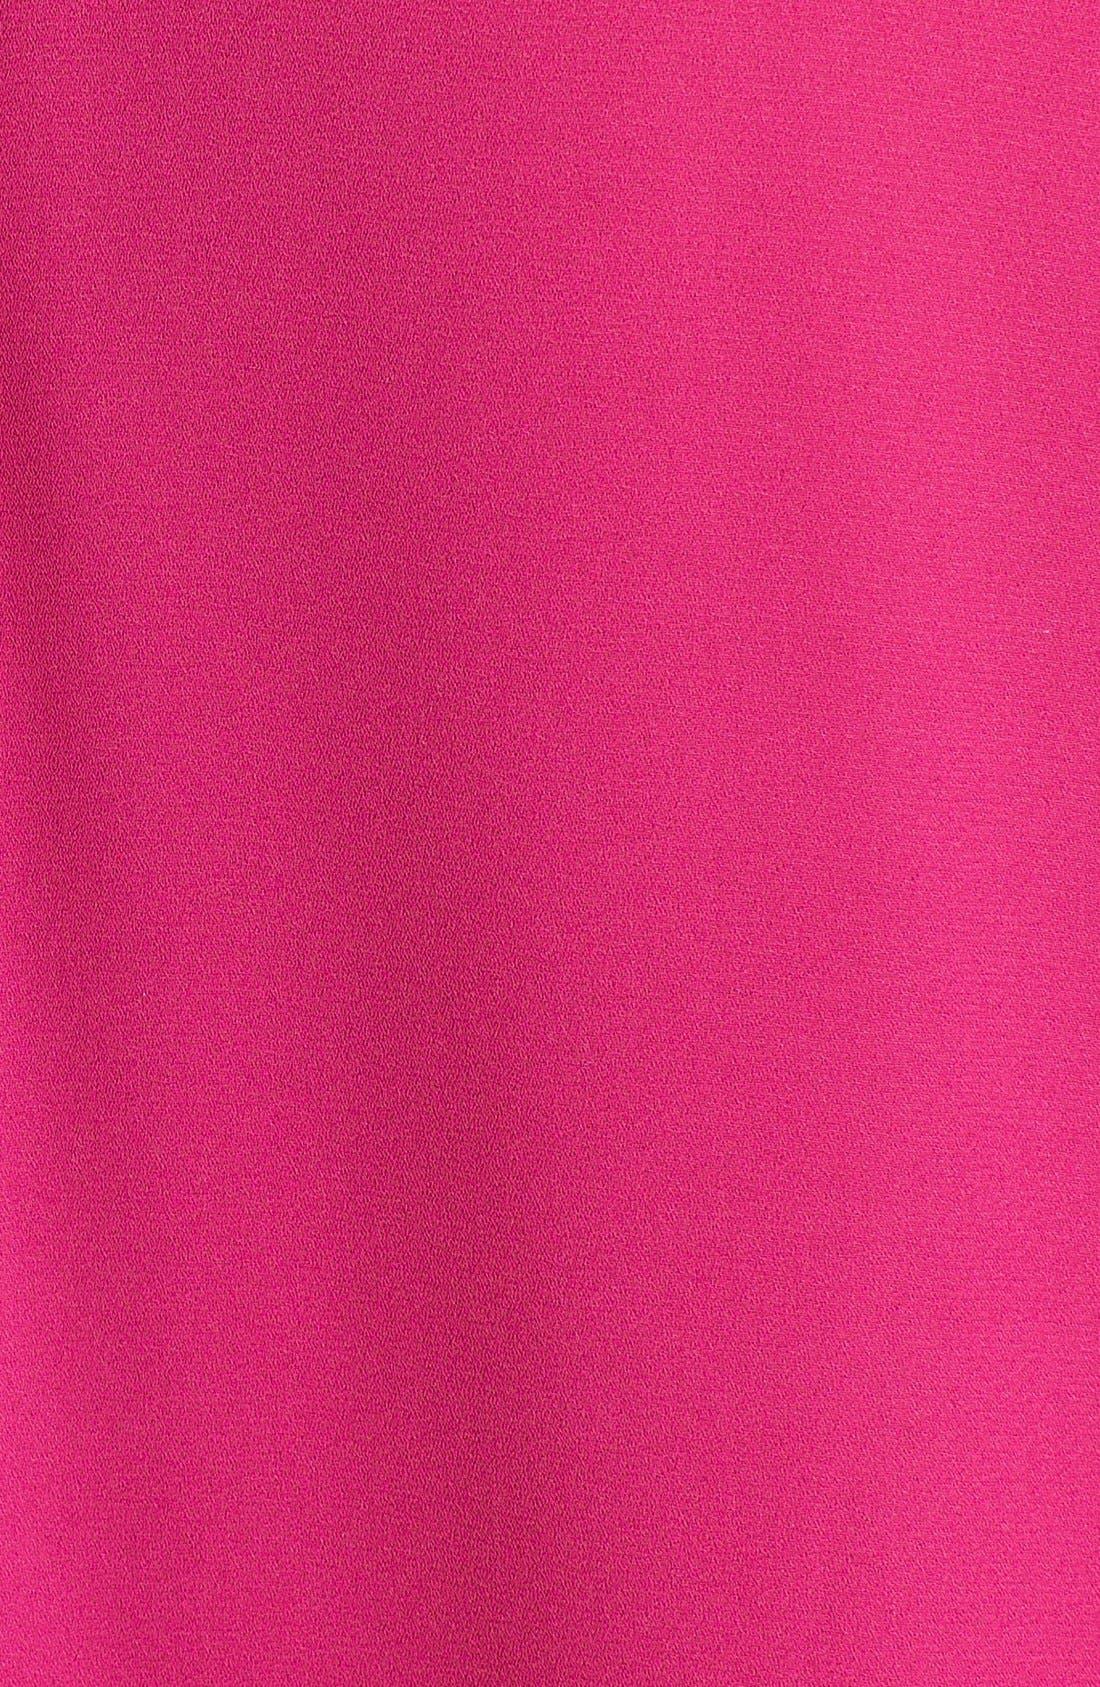 Alternate Image 3  - Pleione Surplice Neckline Top (Plus Size)